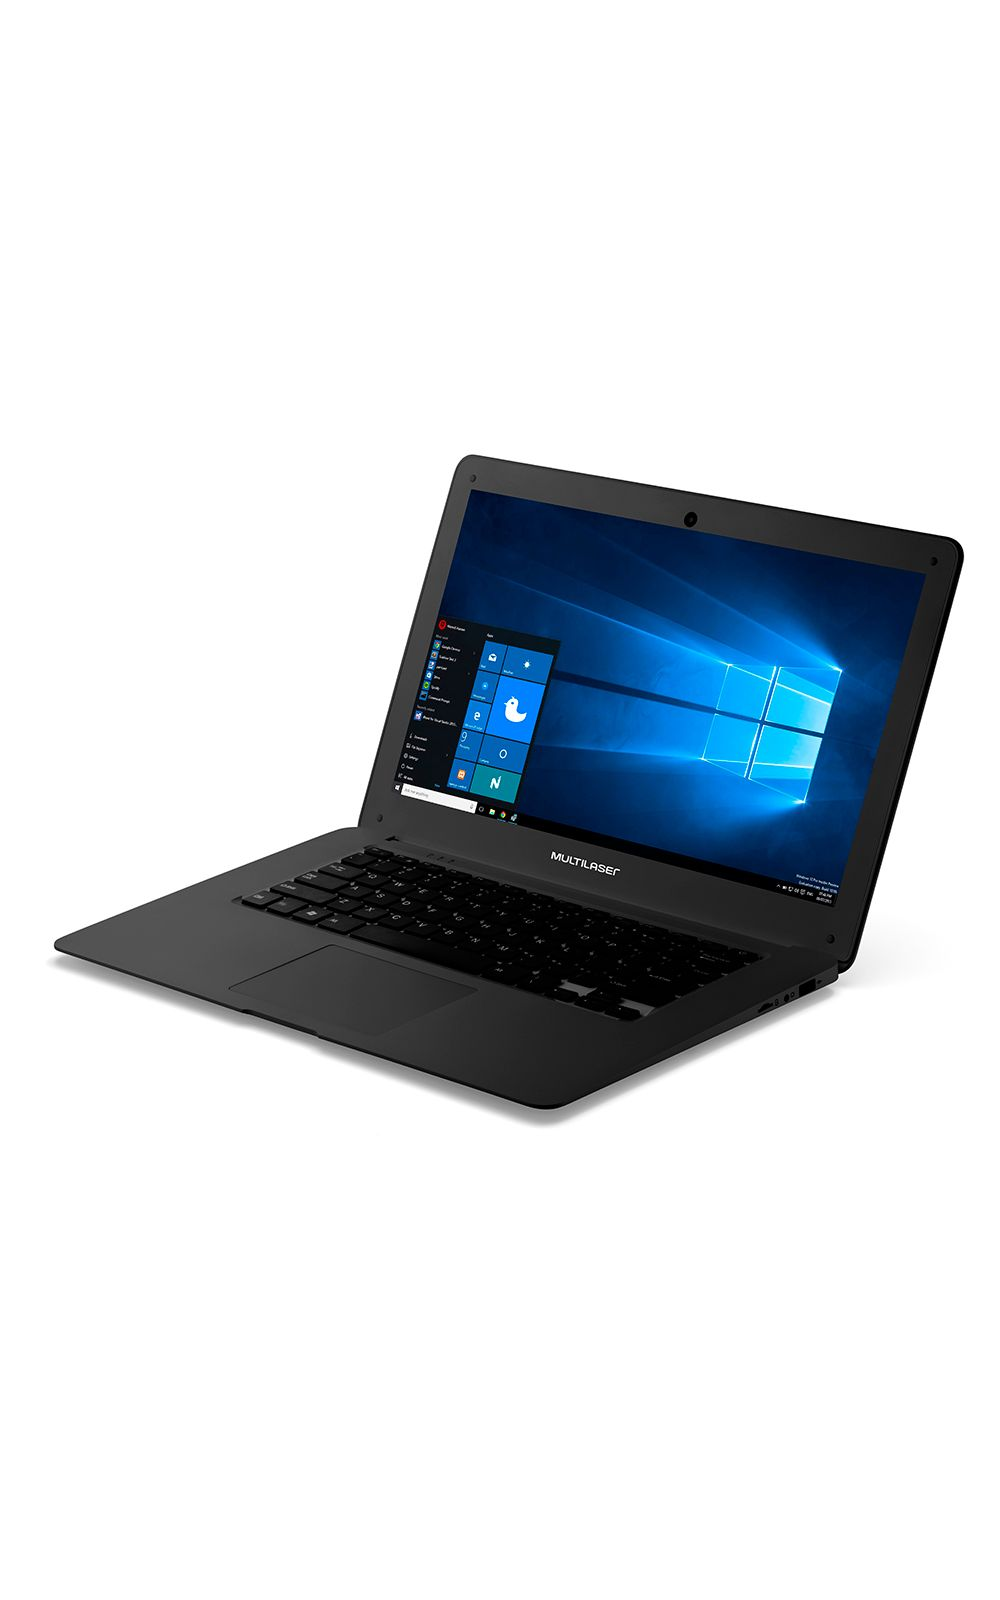 Foto 3 - Notebook Legacy Intel Quad Core Tela Hd 14 Pol. Windows 10 Ram 2Gb Multilaser Preto - PC101